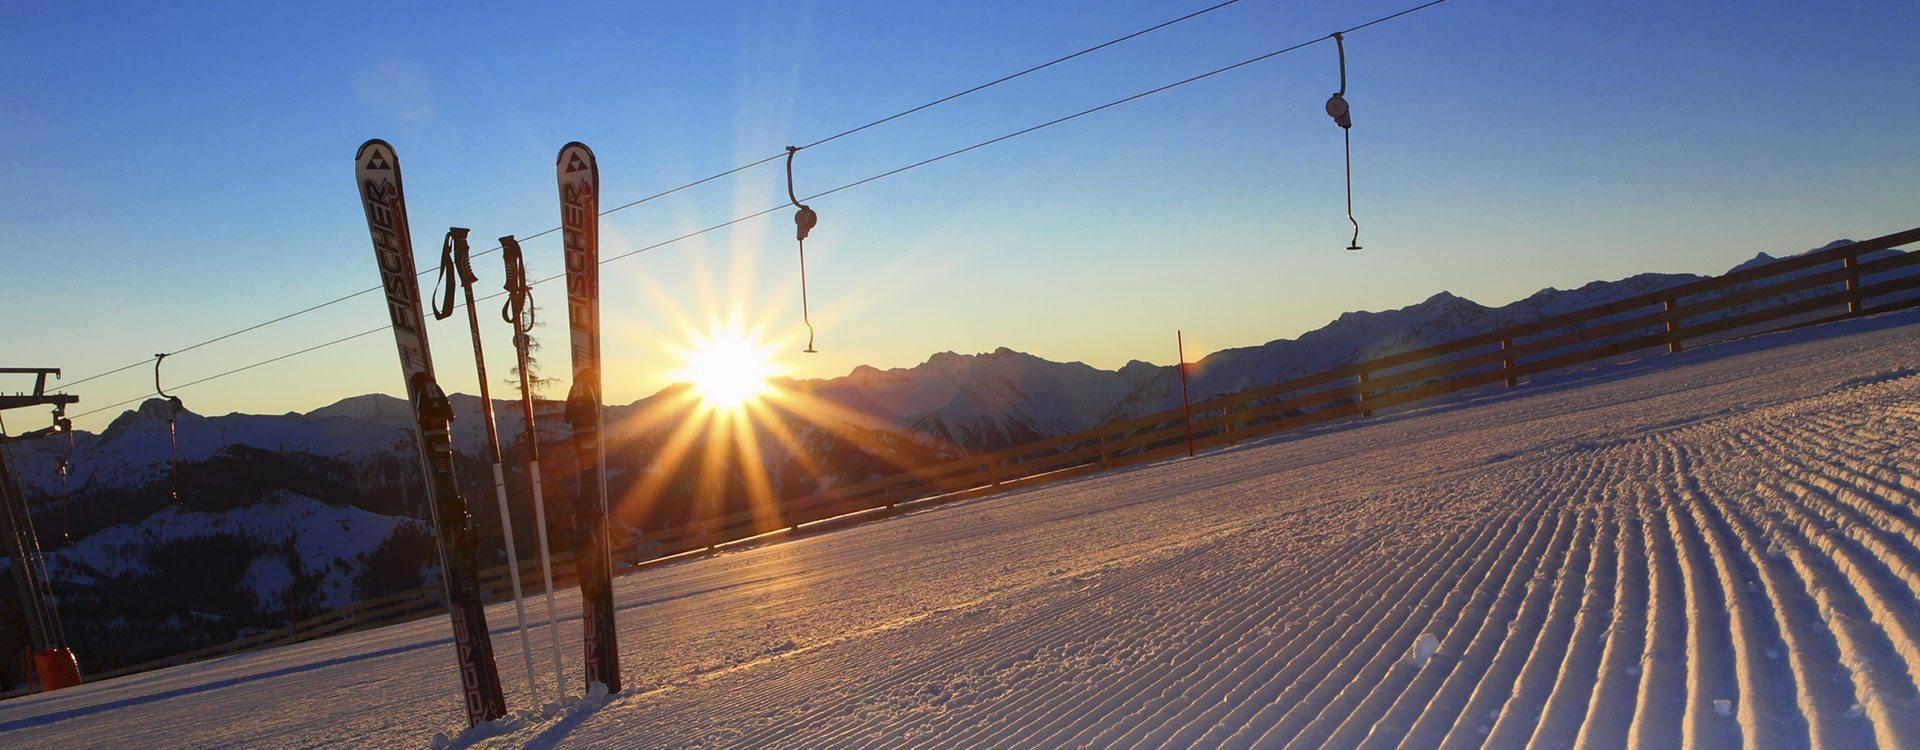 Ihr skiurlaub in gro arl salzburg skifahren in ski amad for Designhotel skifahren